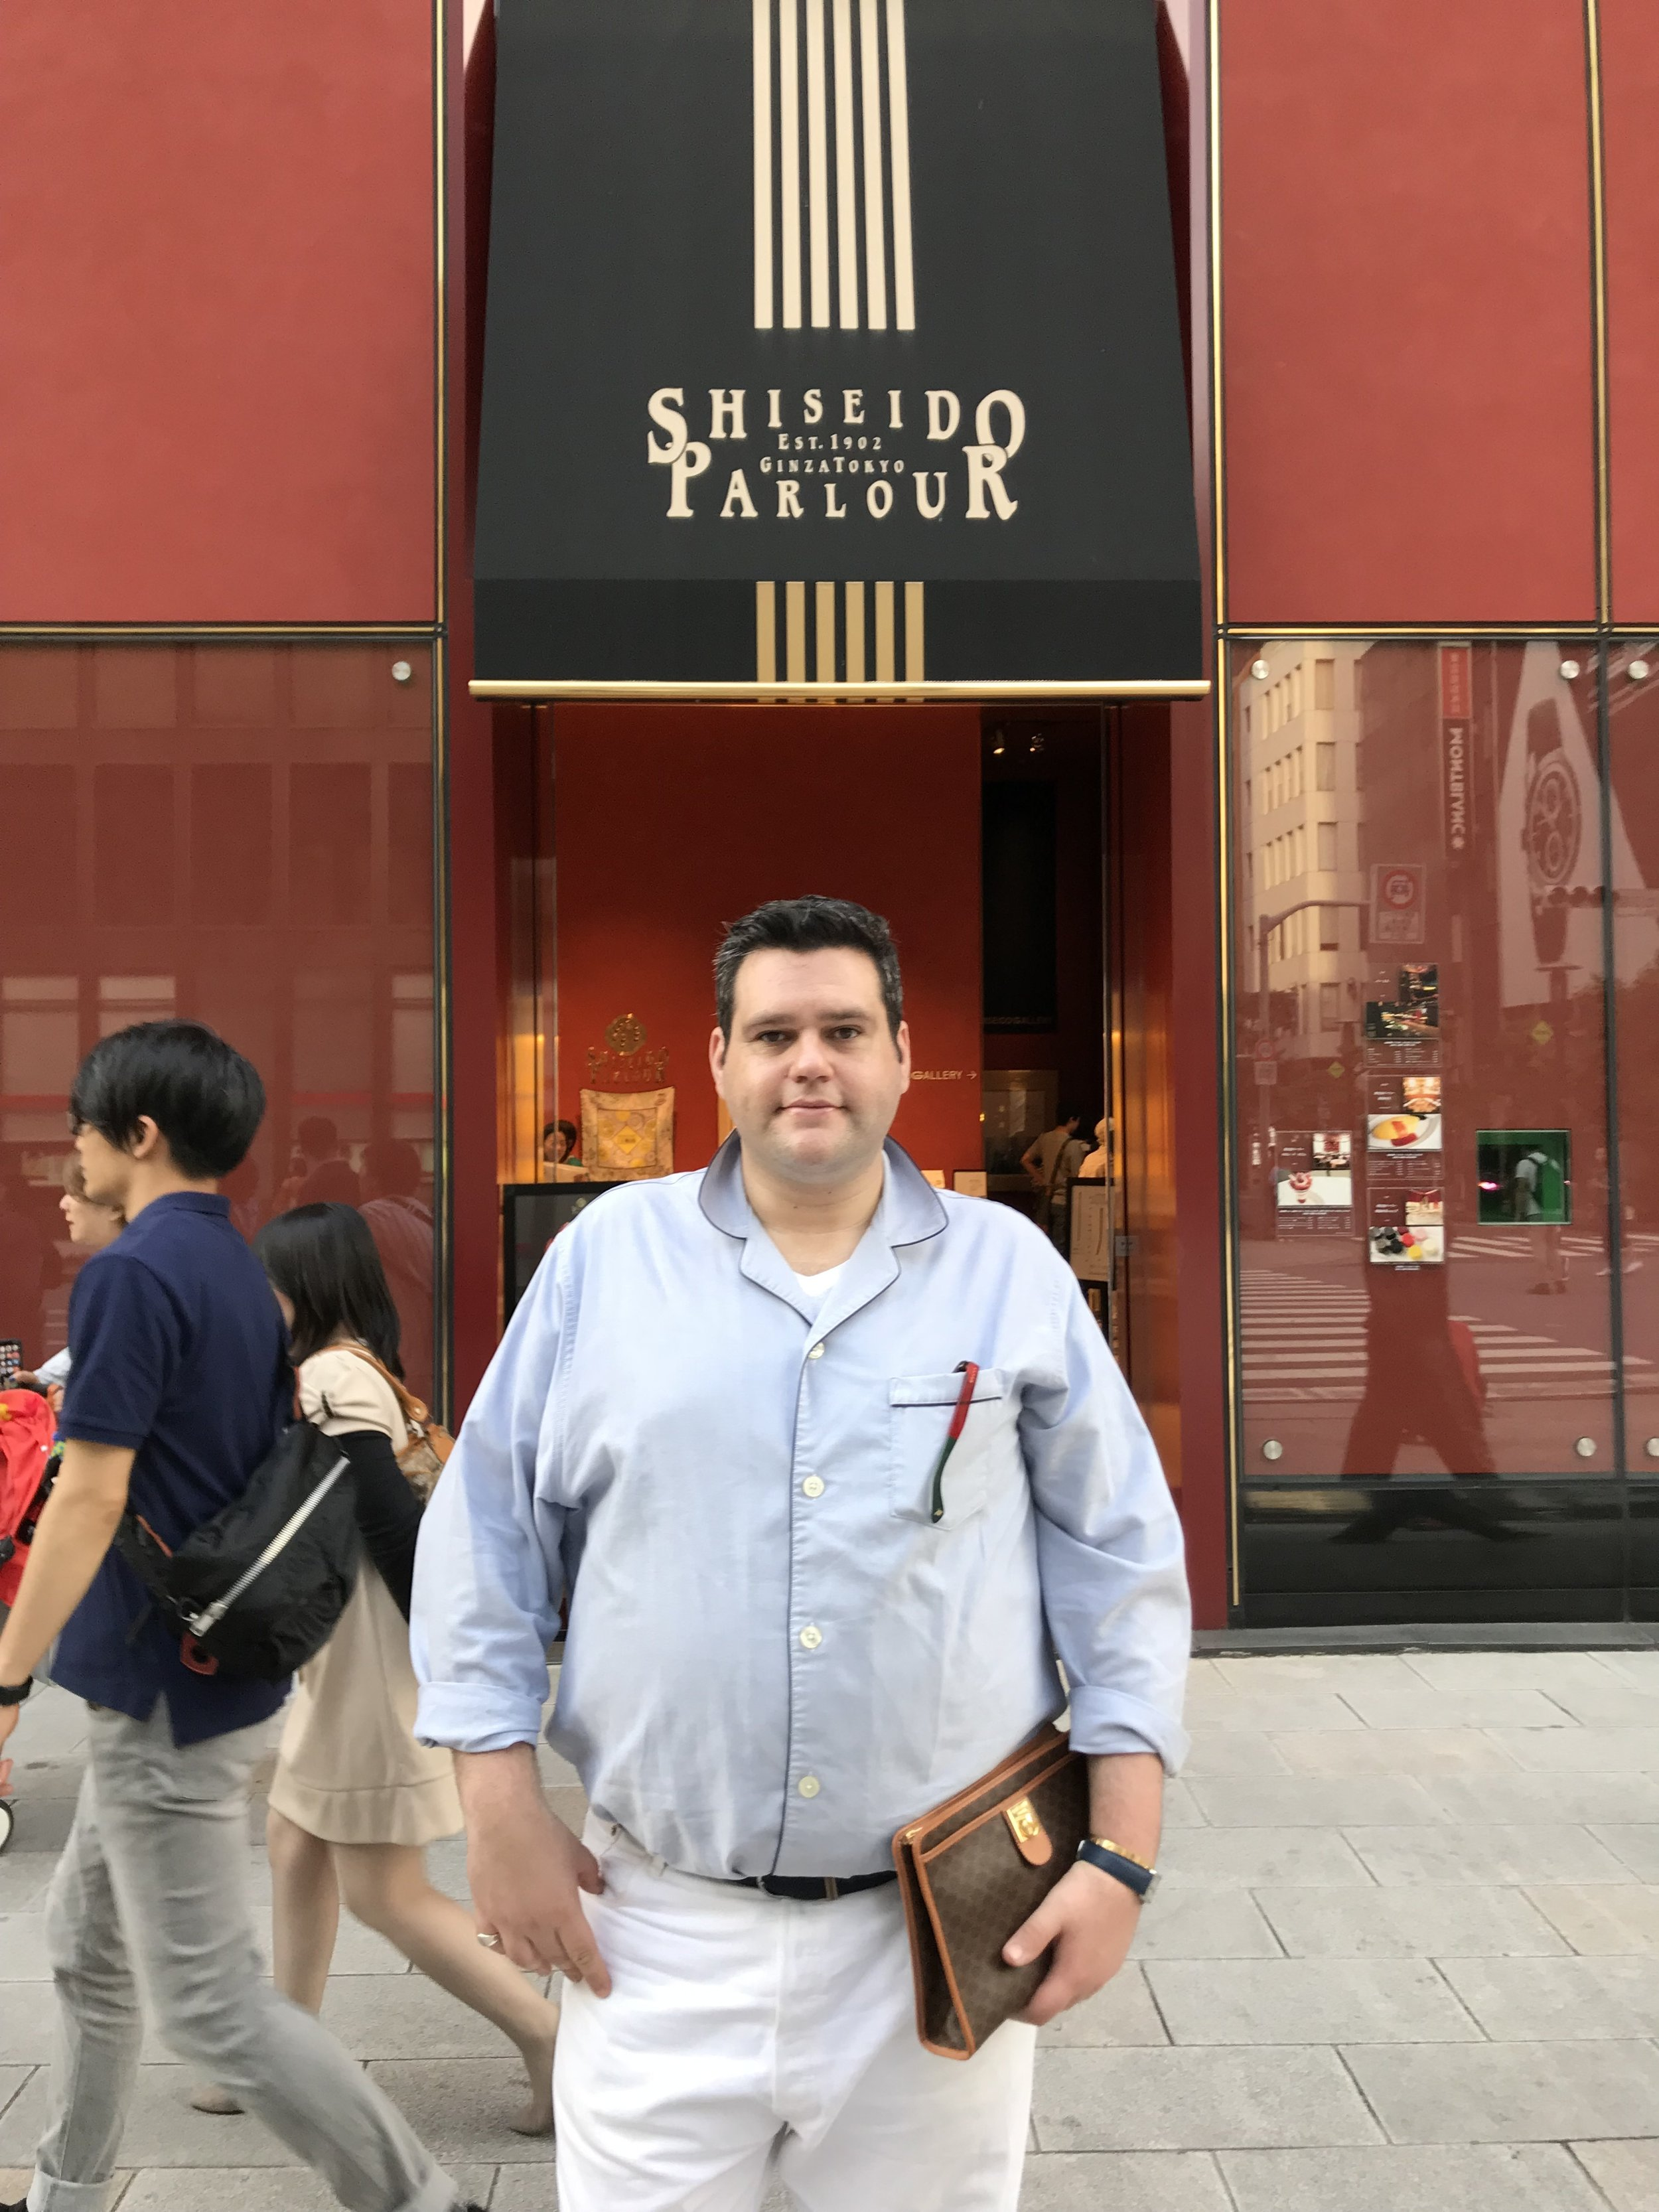 Shiseido all day-do.